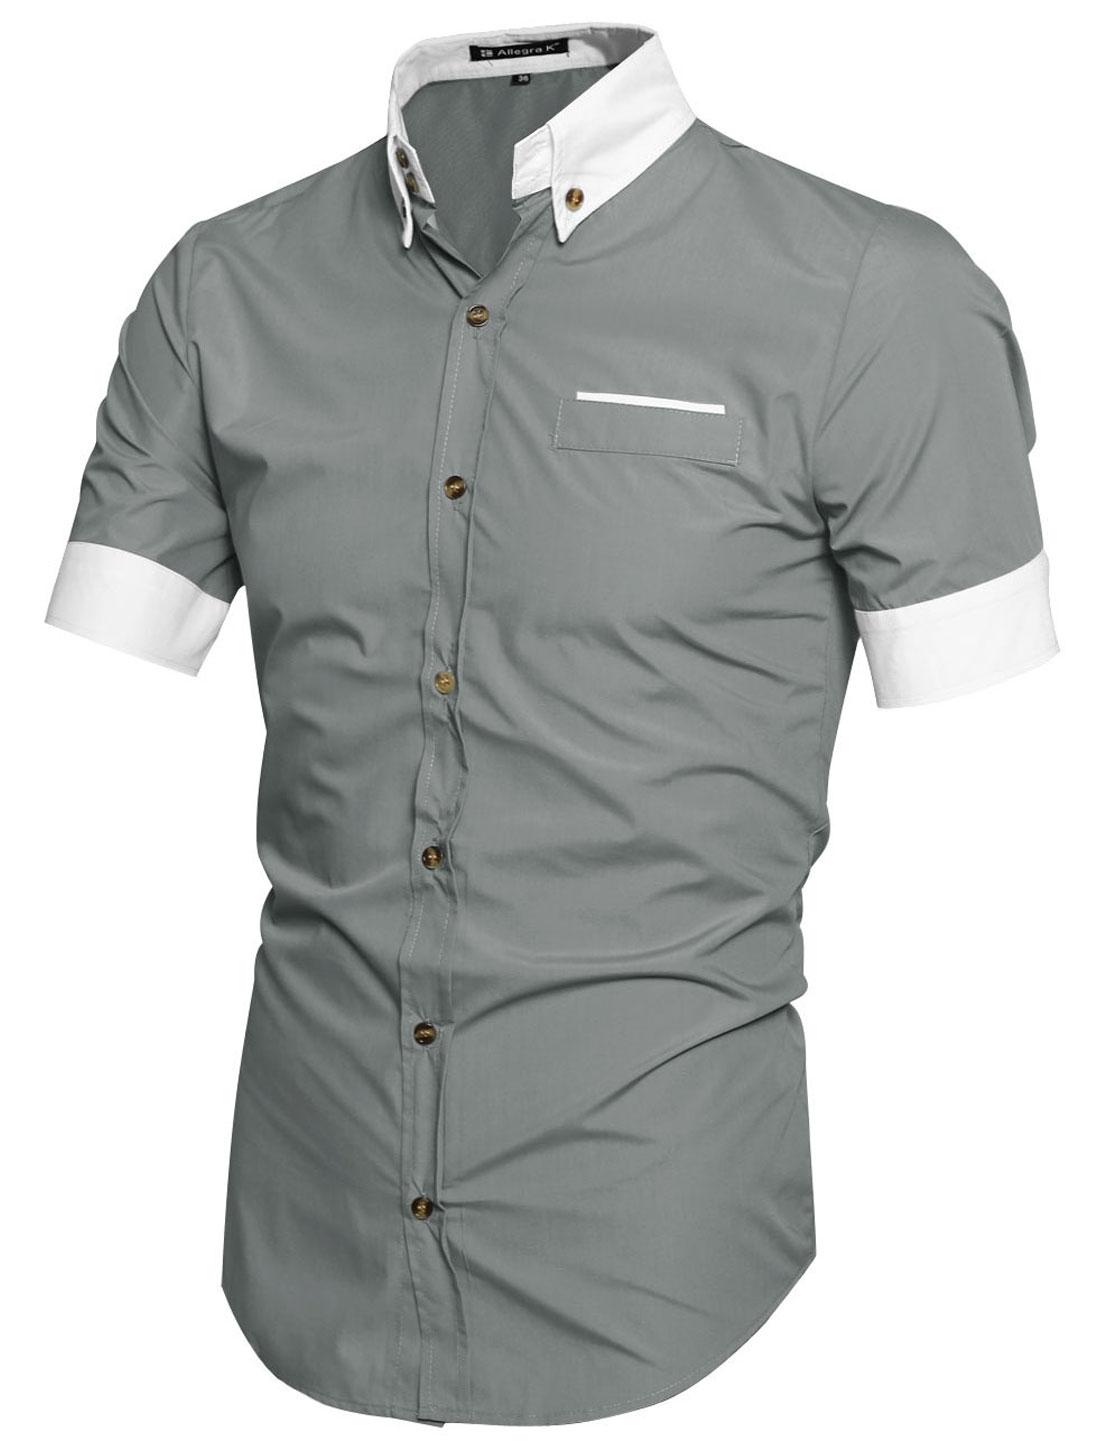 Men Contrast Color Short Sleeves Button Down Shirt Light Gray L